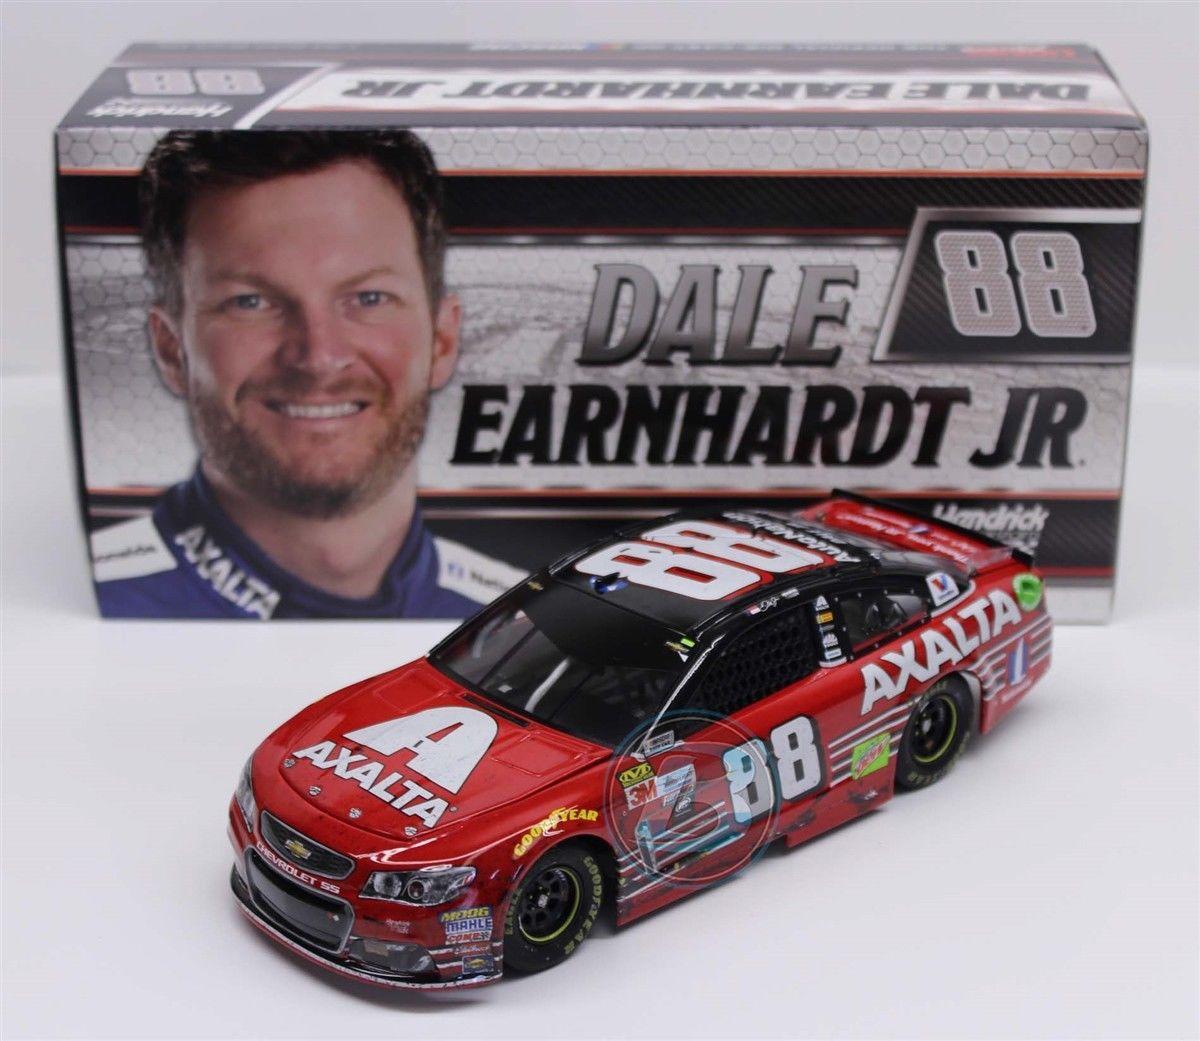 NASCAR 2017 DALE EARNHARDT JR #88 HOMESTEAD RACED VERSION FINAL RIDE 1/24 CAR